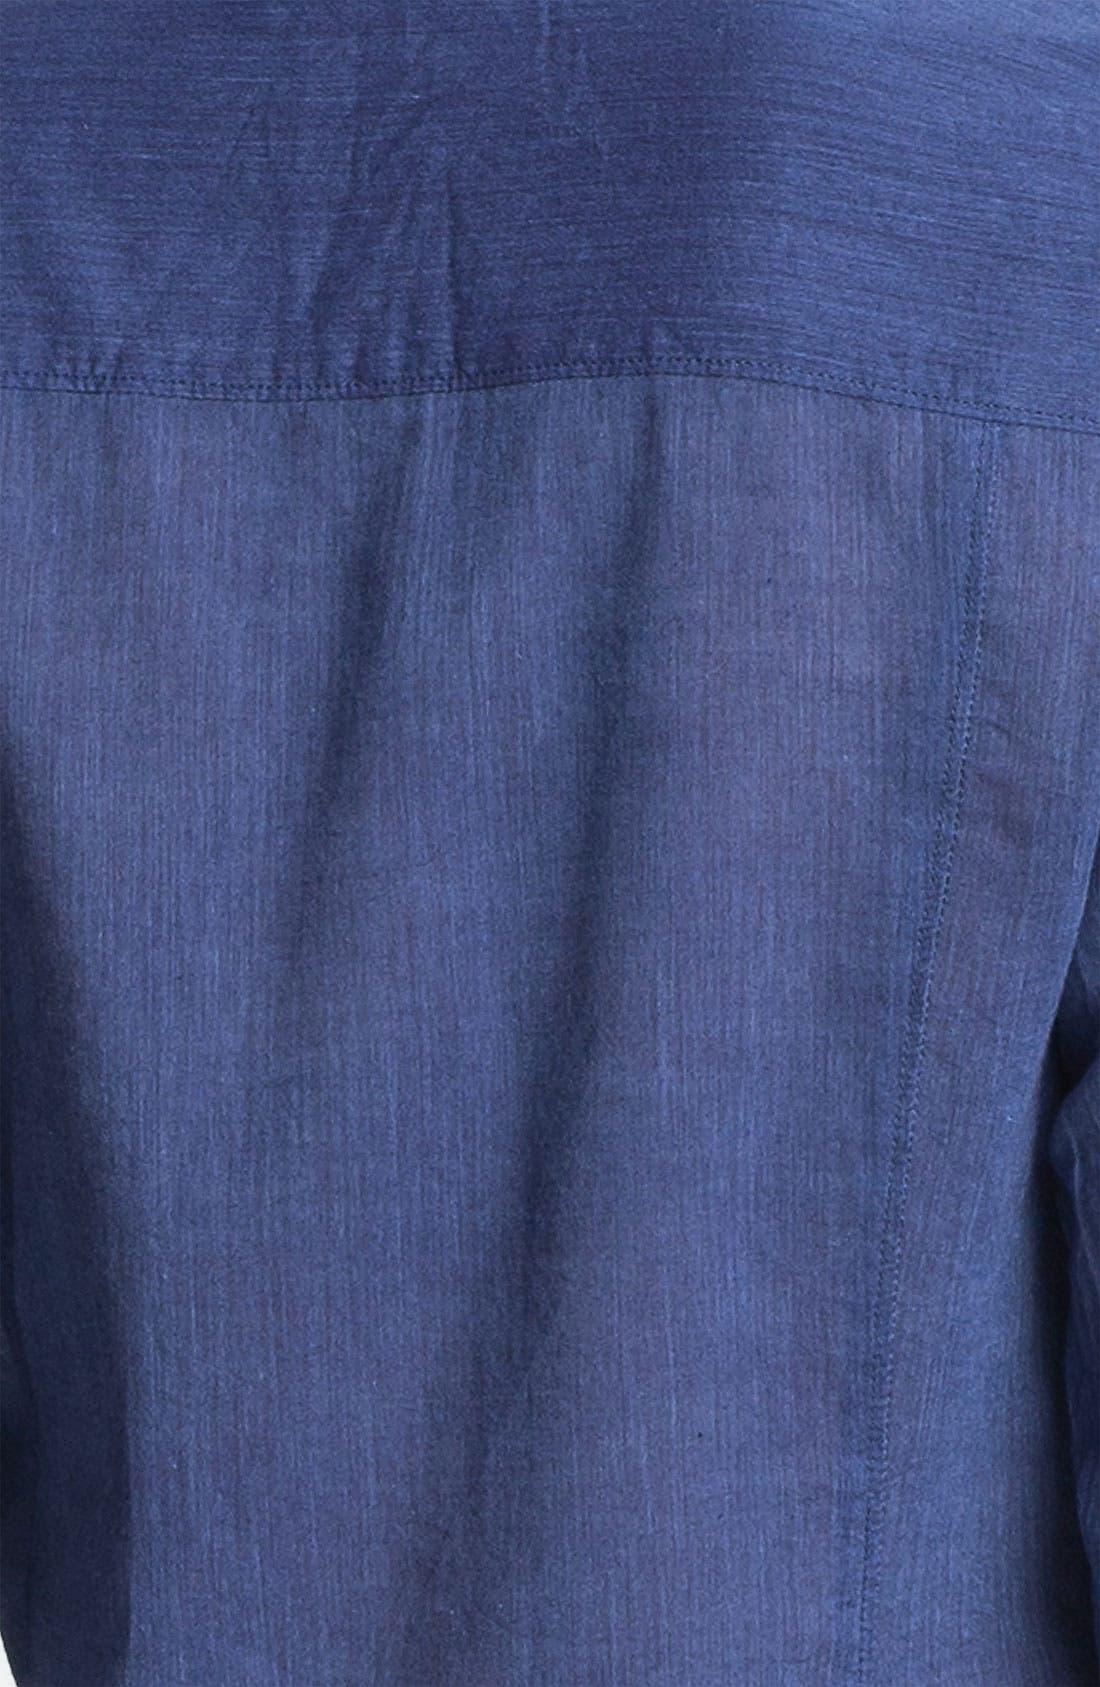 Long Sleeve Shirt,                             Alternate thumbnail 56, color,